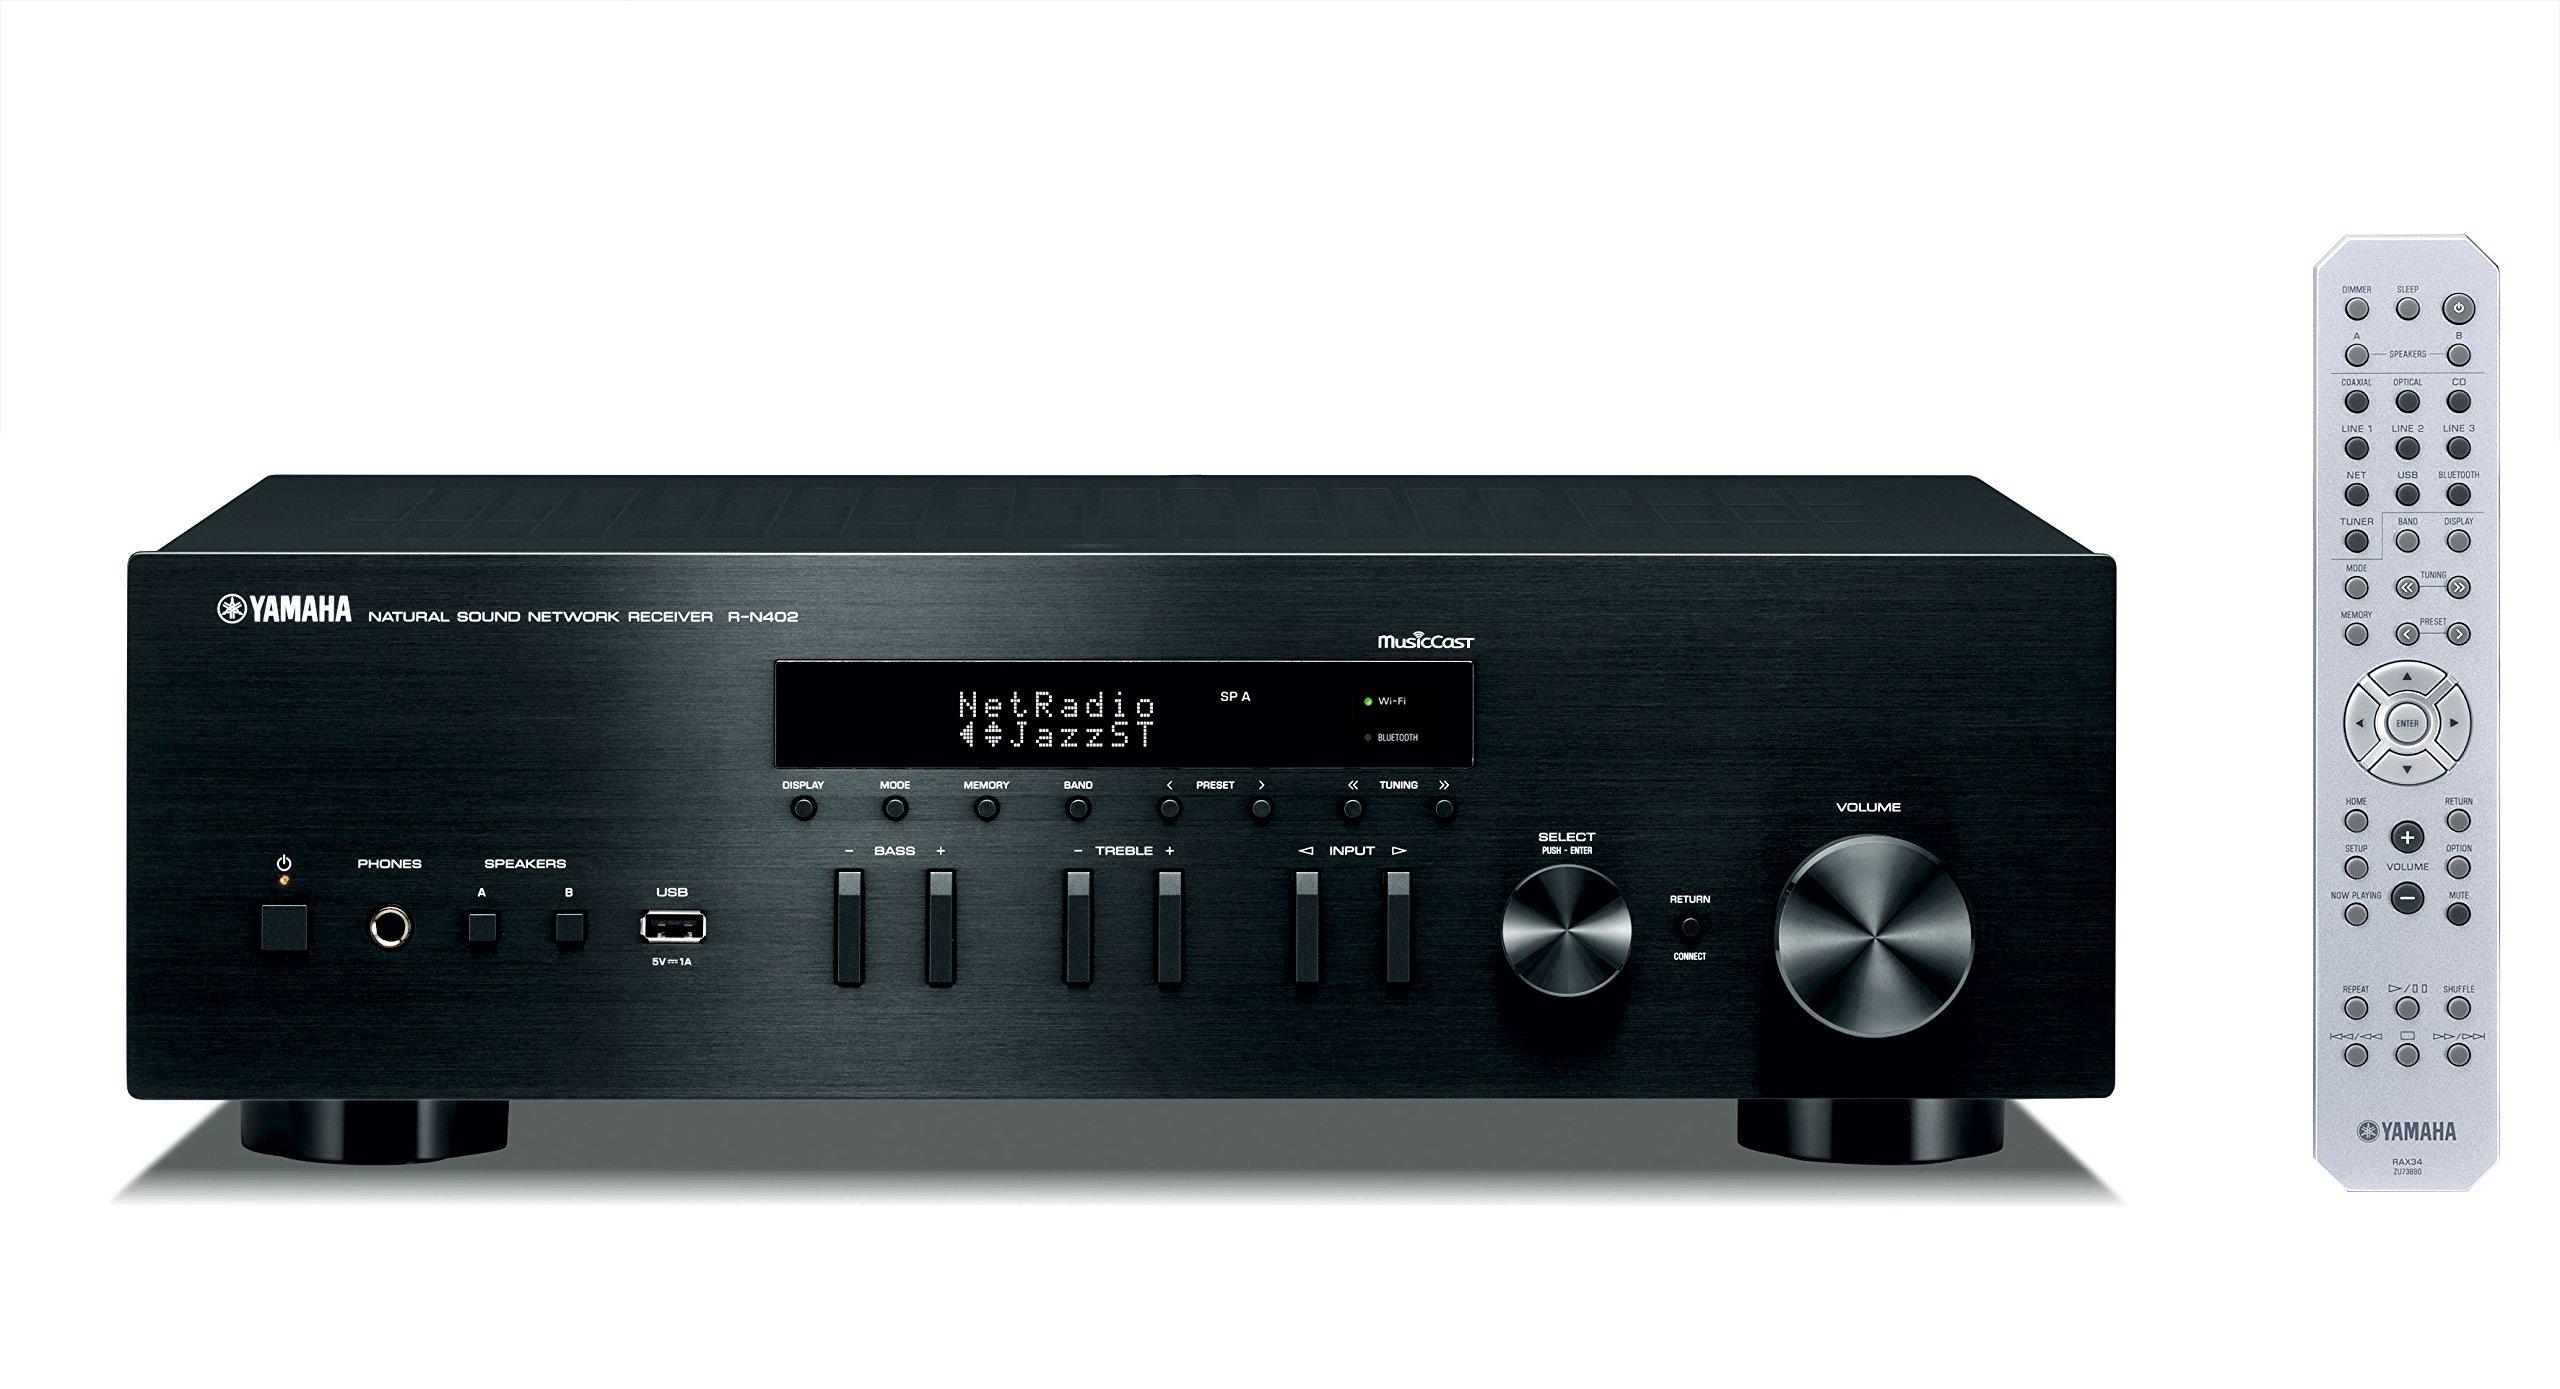 Yamaha MusicCast R-N402 Hi-Fi Network Receiver by Yamaha